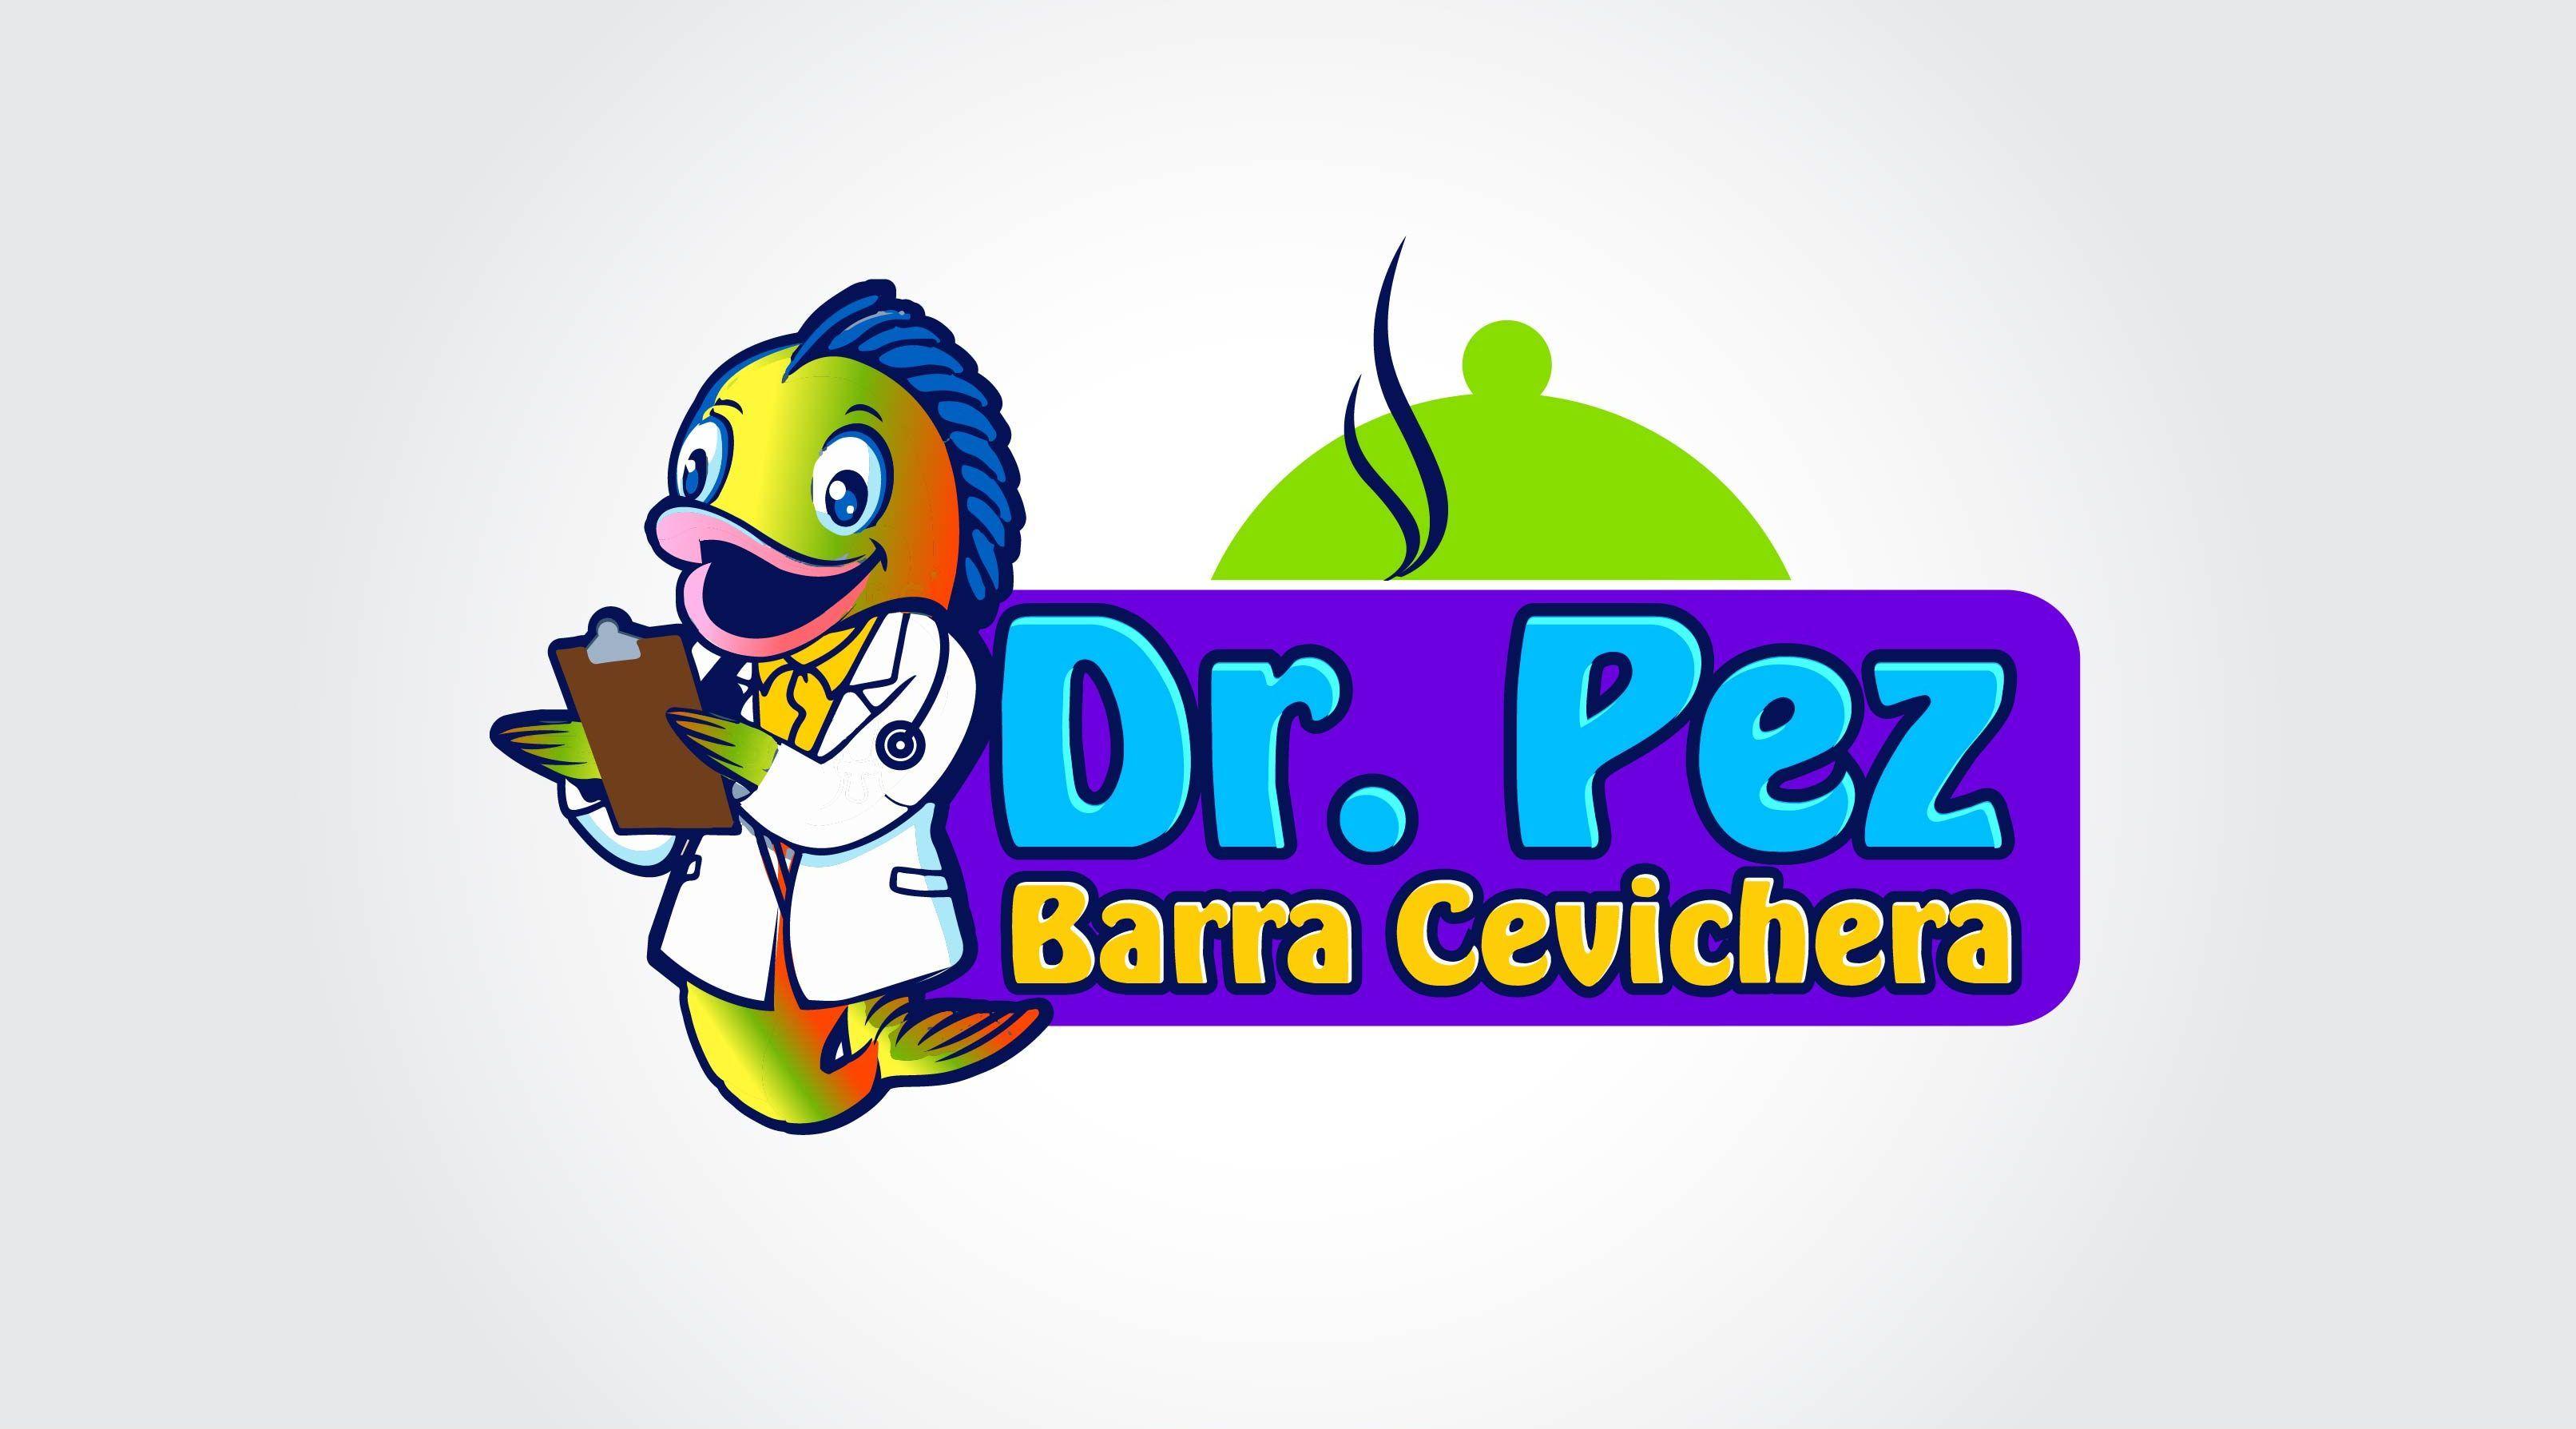 Dr. Pez fish Doctor Graphic design services, Cartoon